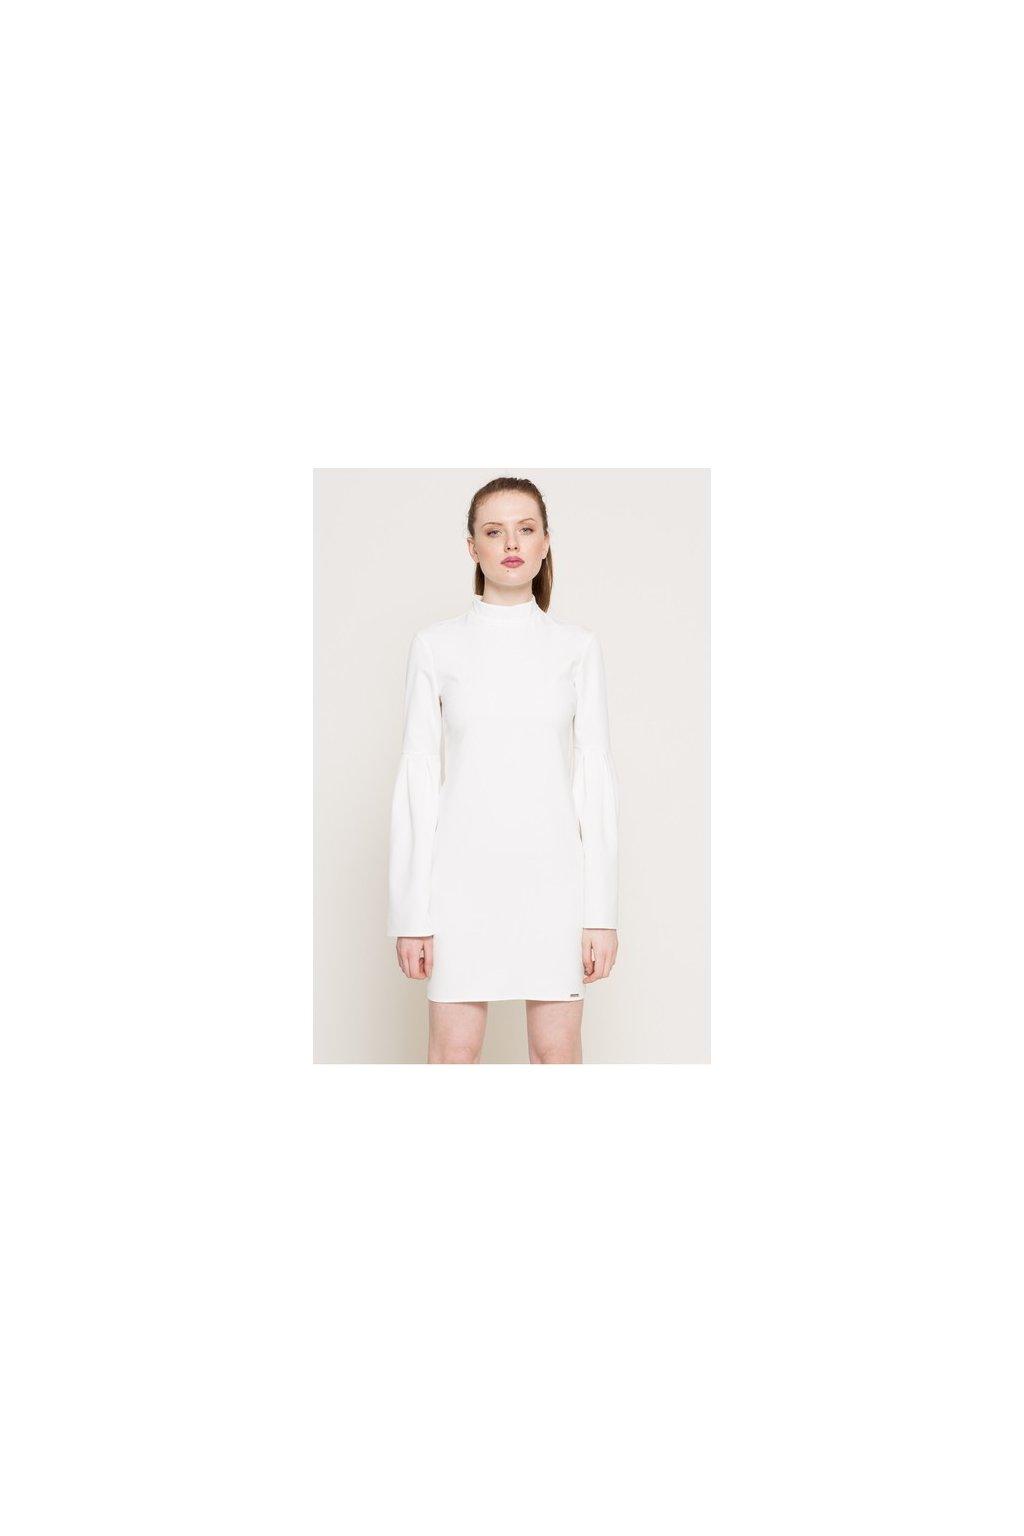 Dámské šaty Guess w72k1y-k6h30